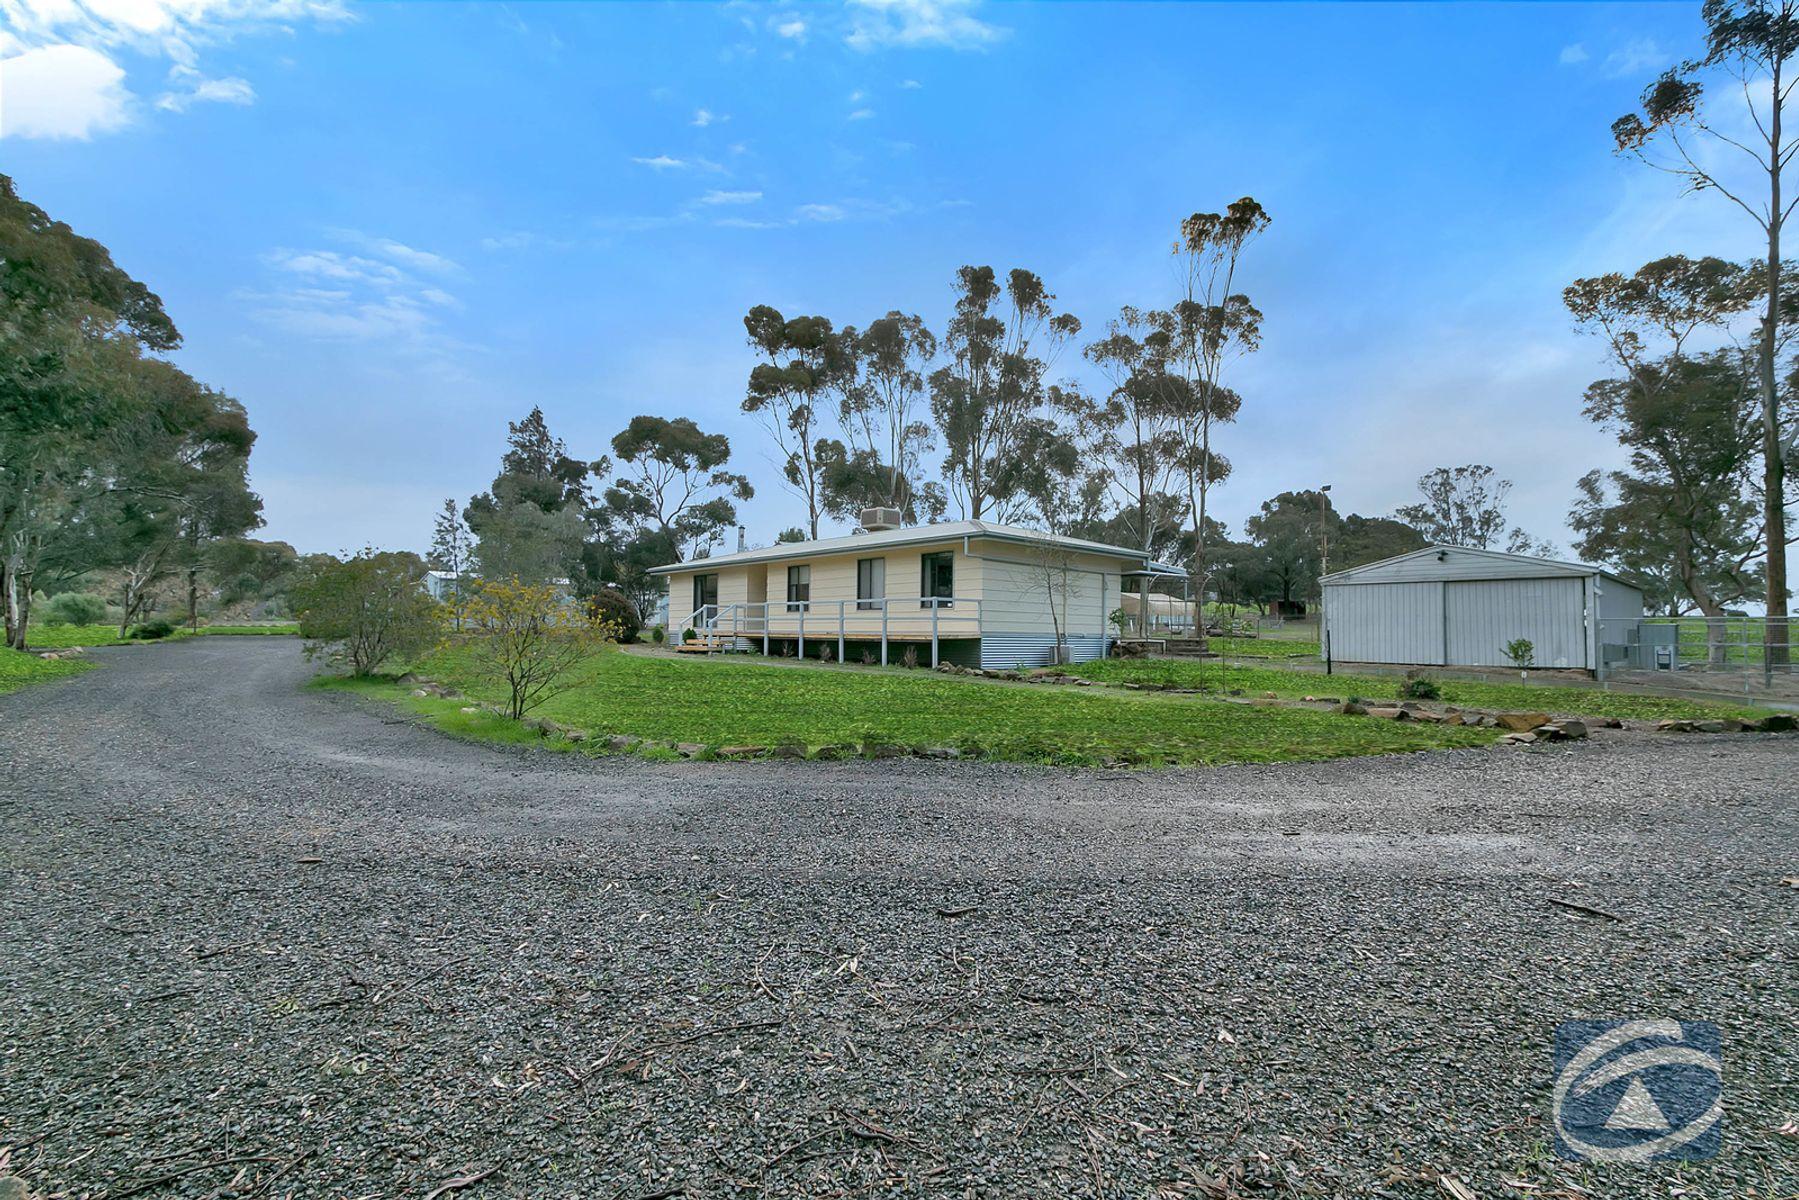 14-16 Observatory Road, Stockport, SA 5410